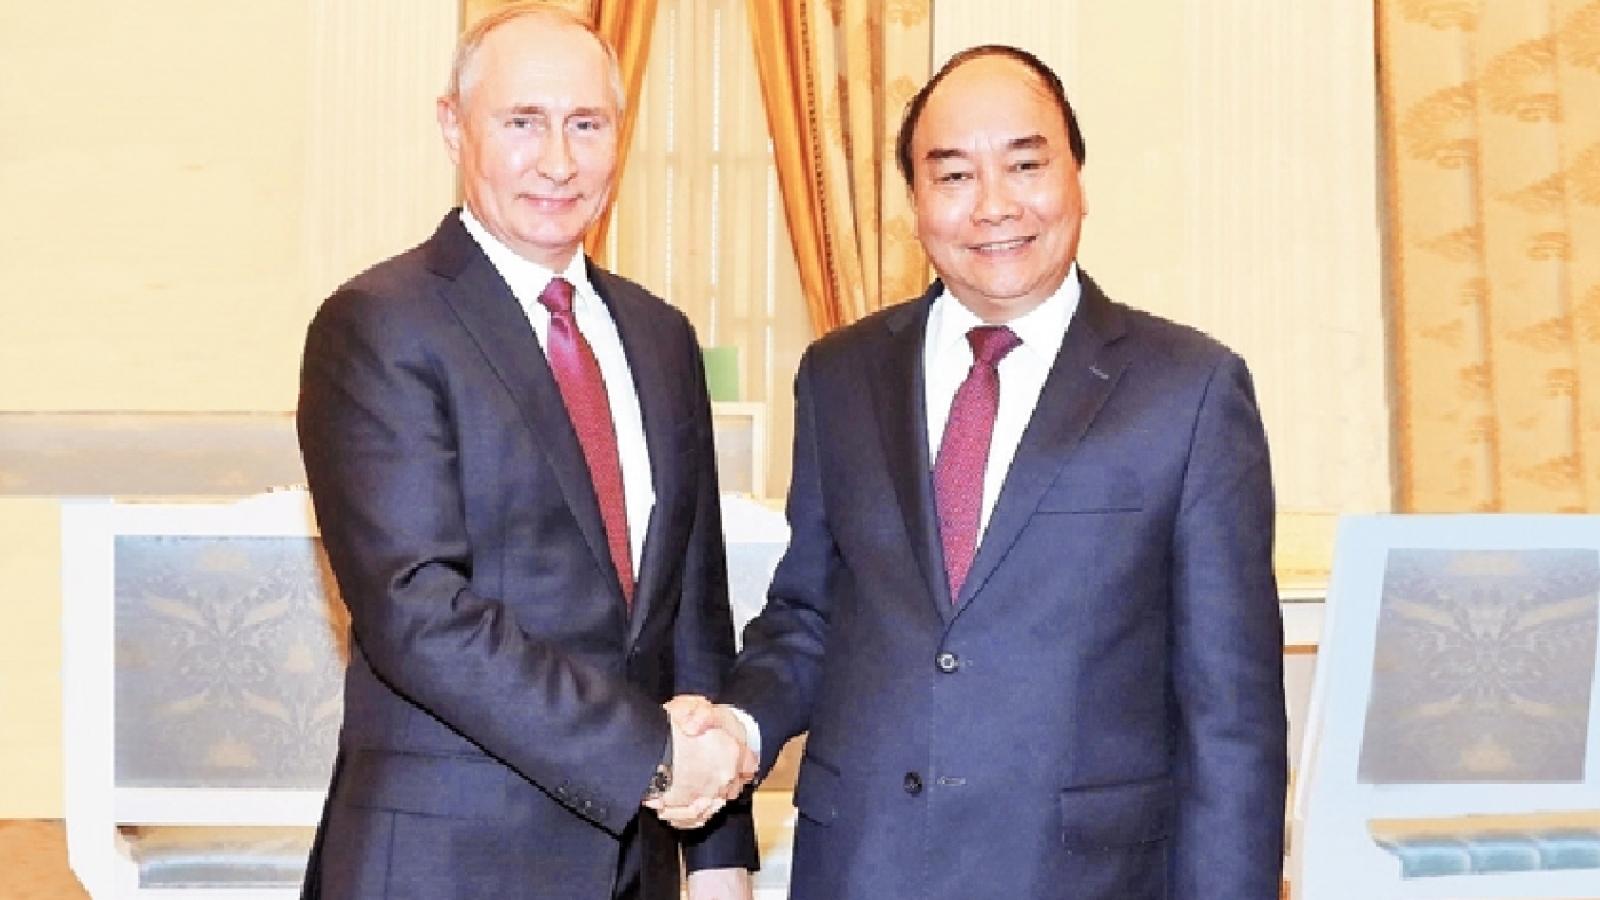 President Putin congratulates newly-elected President Nguyen Xuan Phuc